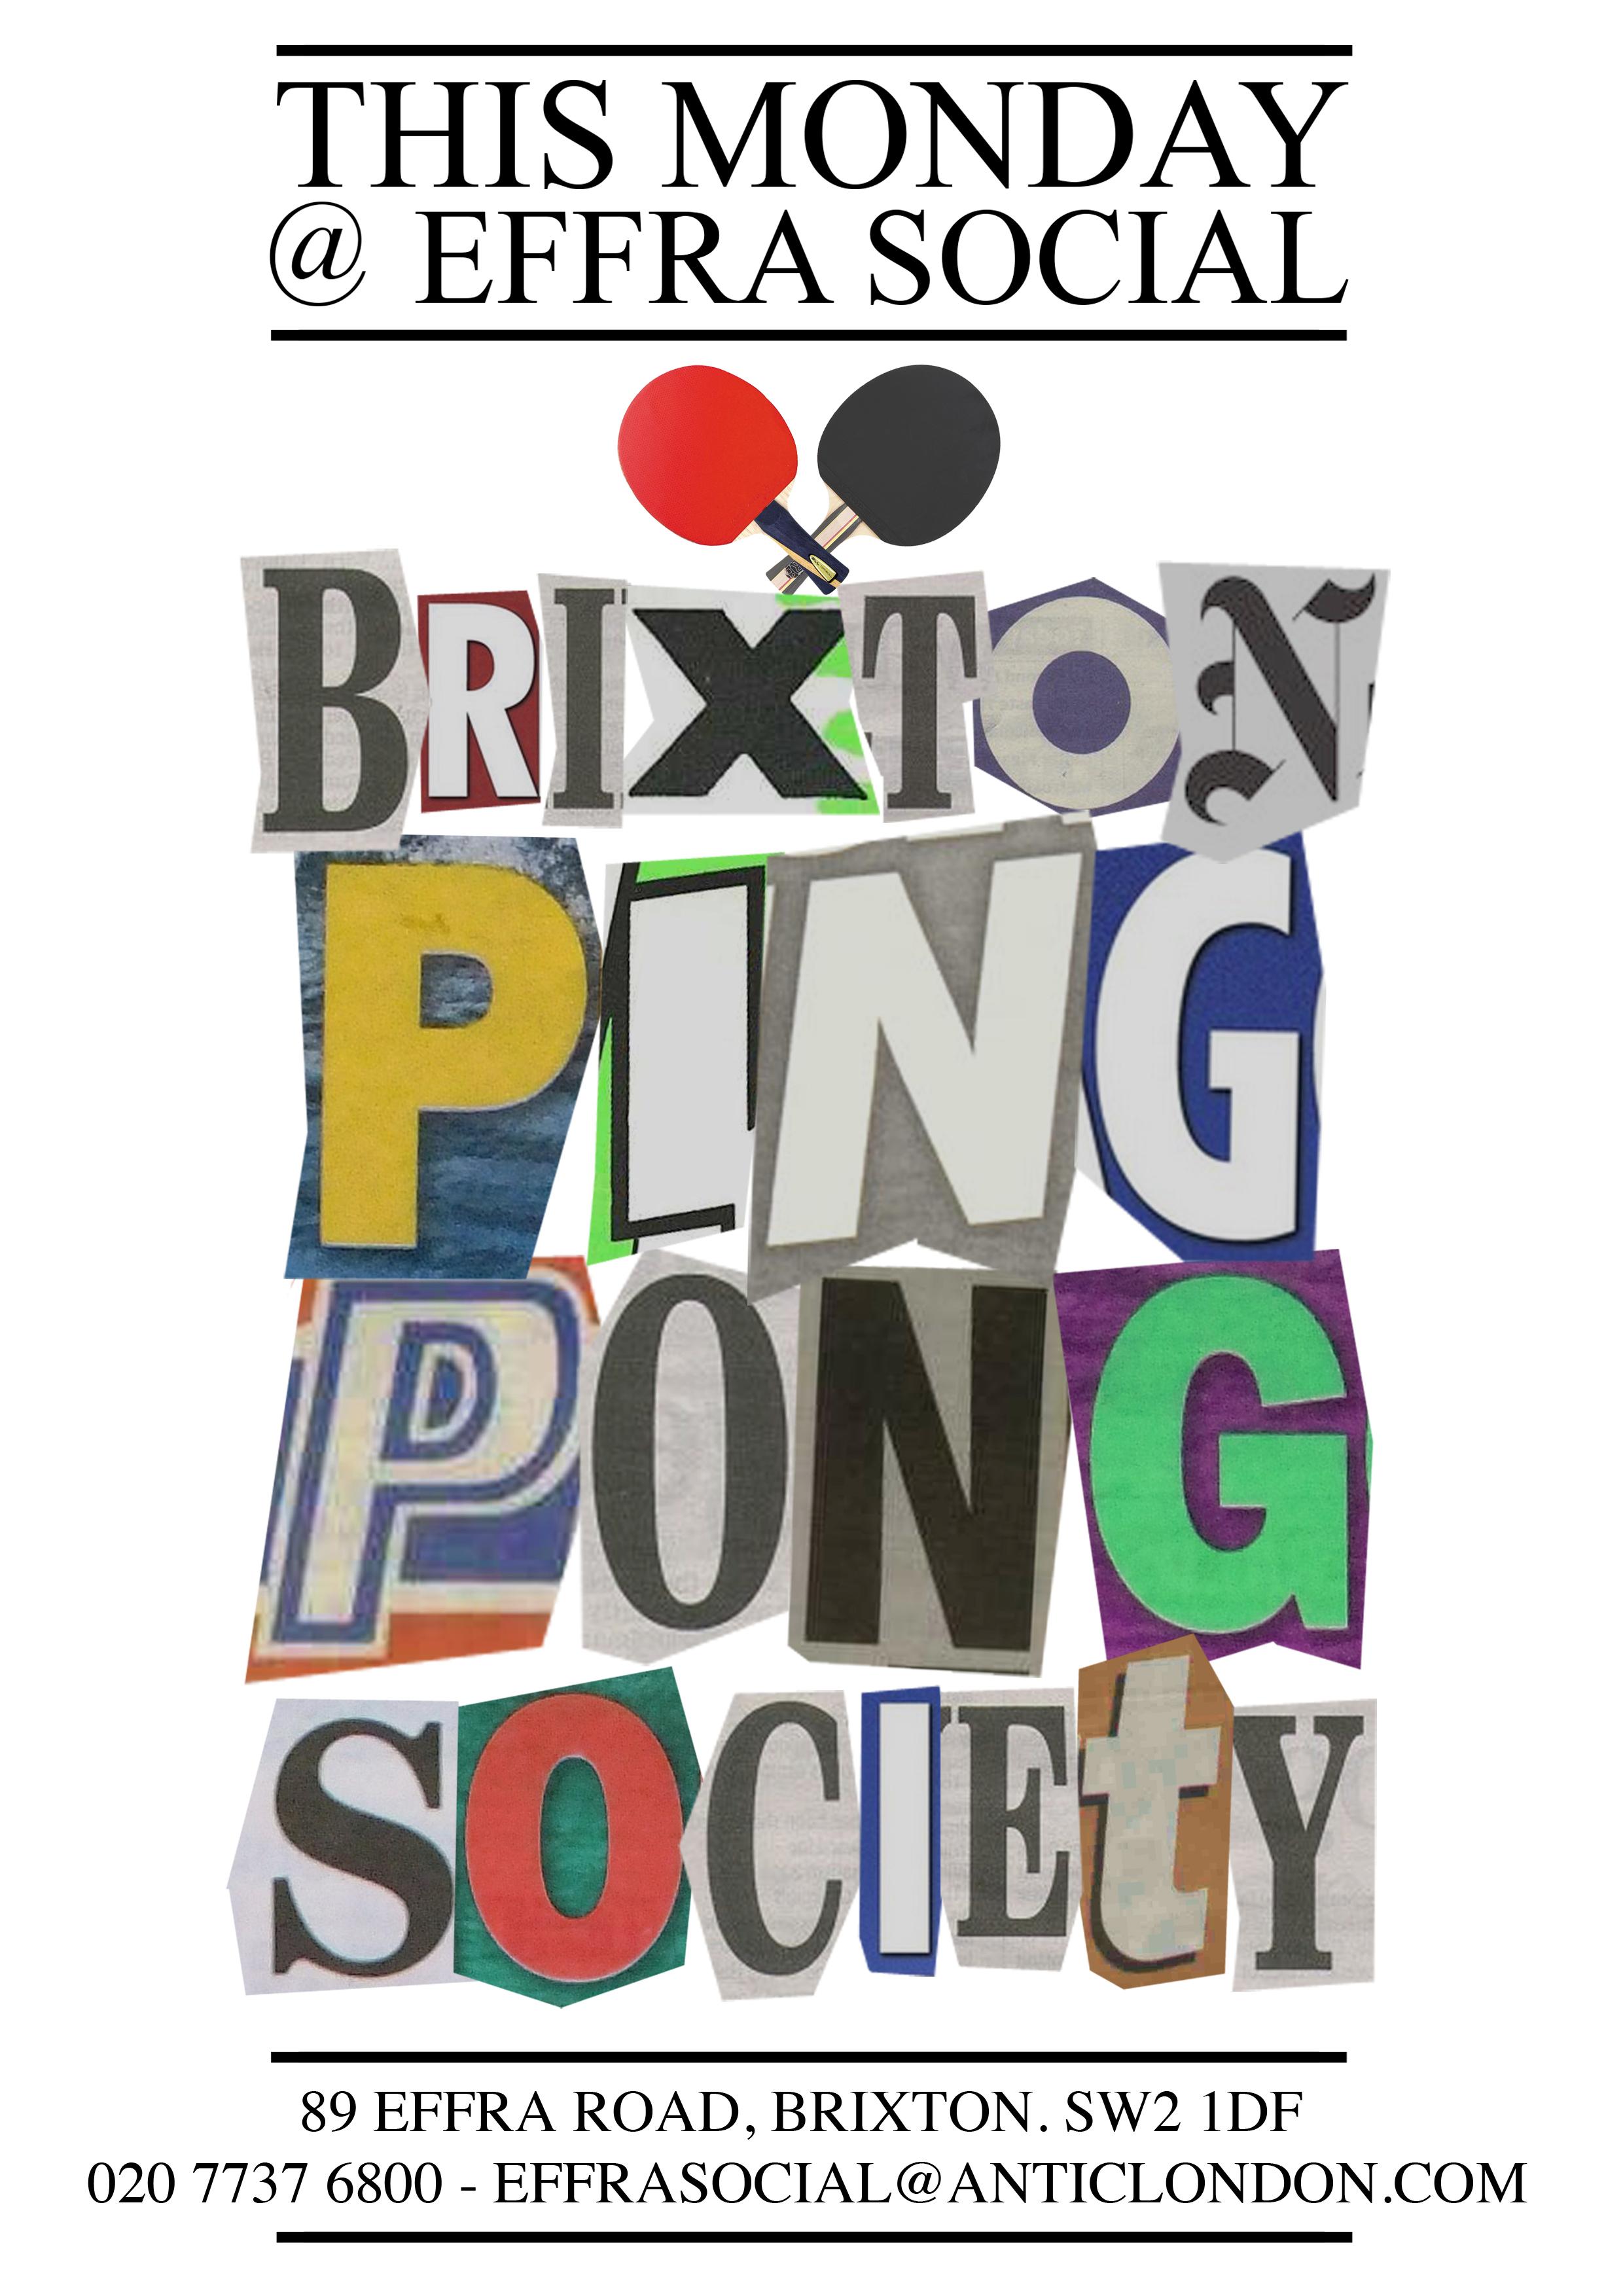 Ping Pong This Monday